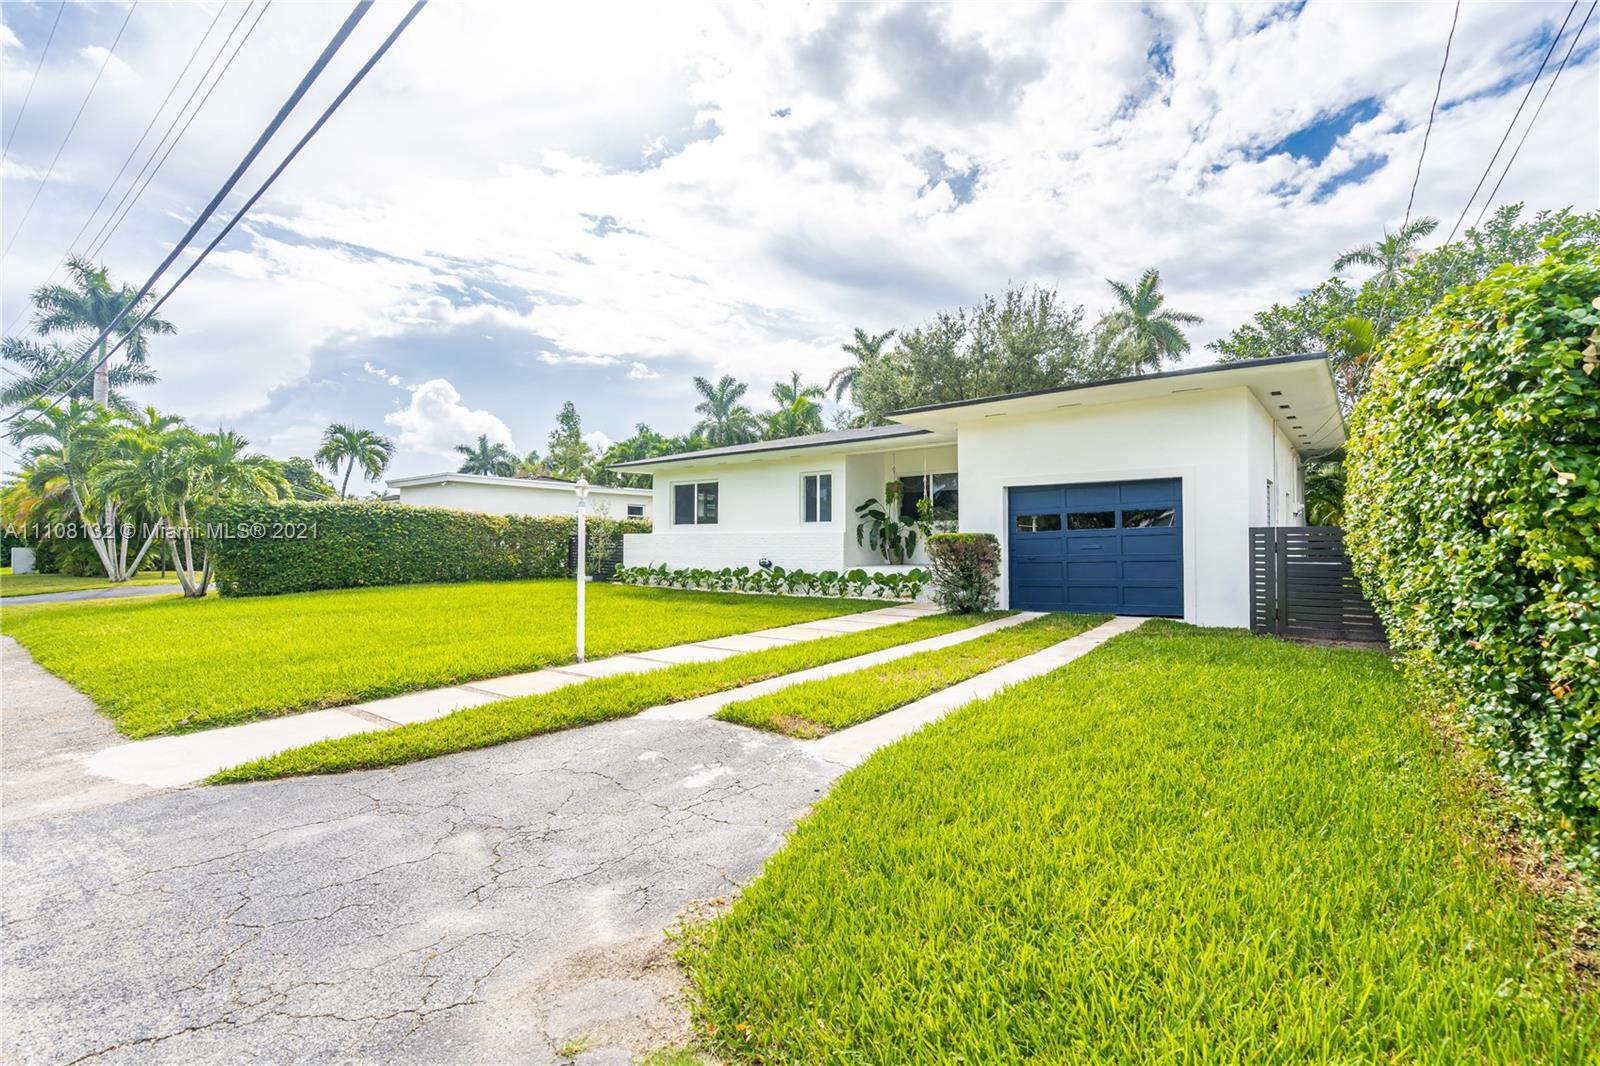 Single Family Home,For Sale,410 NE 116 St, Miami, Florida 33161,Brickell,realty,broker,condos near me